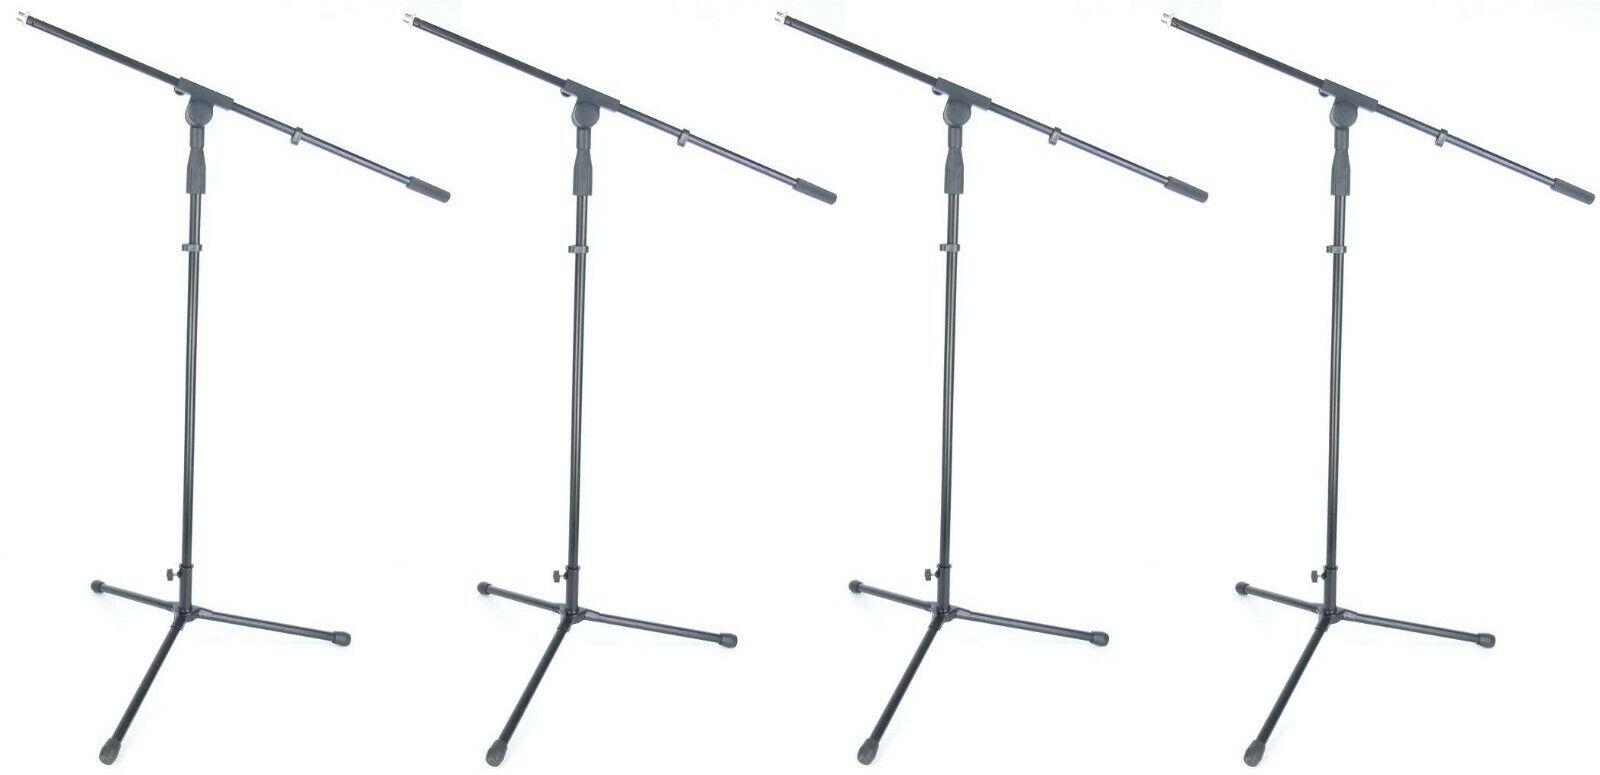 4 x Microphone Stand Mic Tripod ADM S22B mirkofonstativ with Gallows/Swing Arm